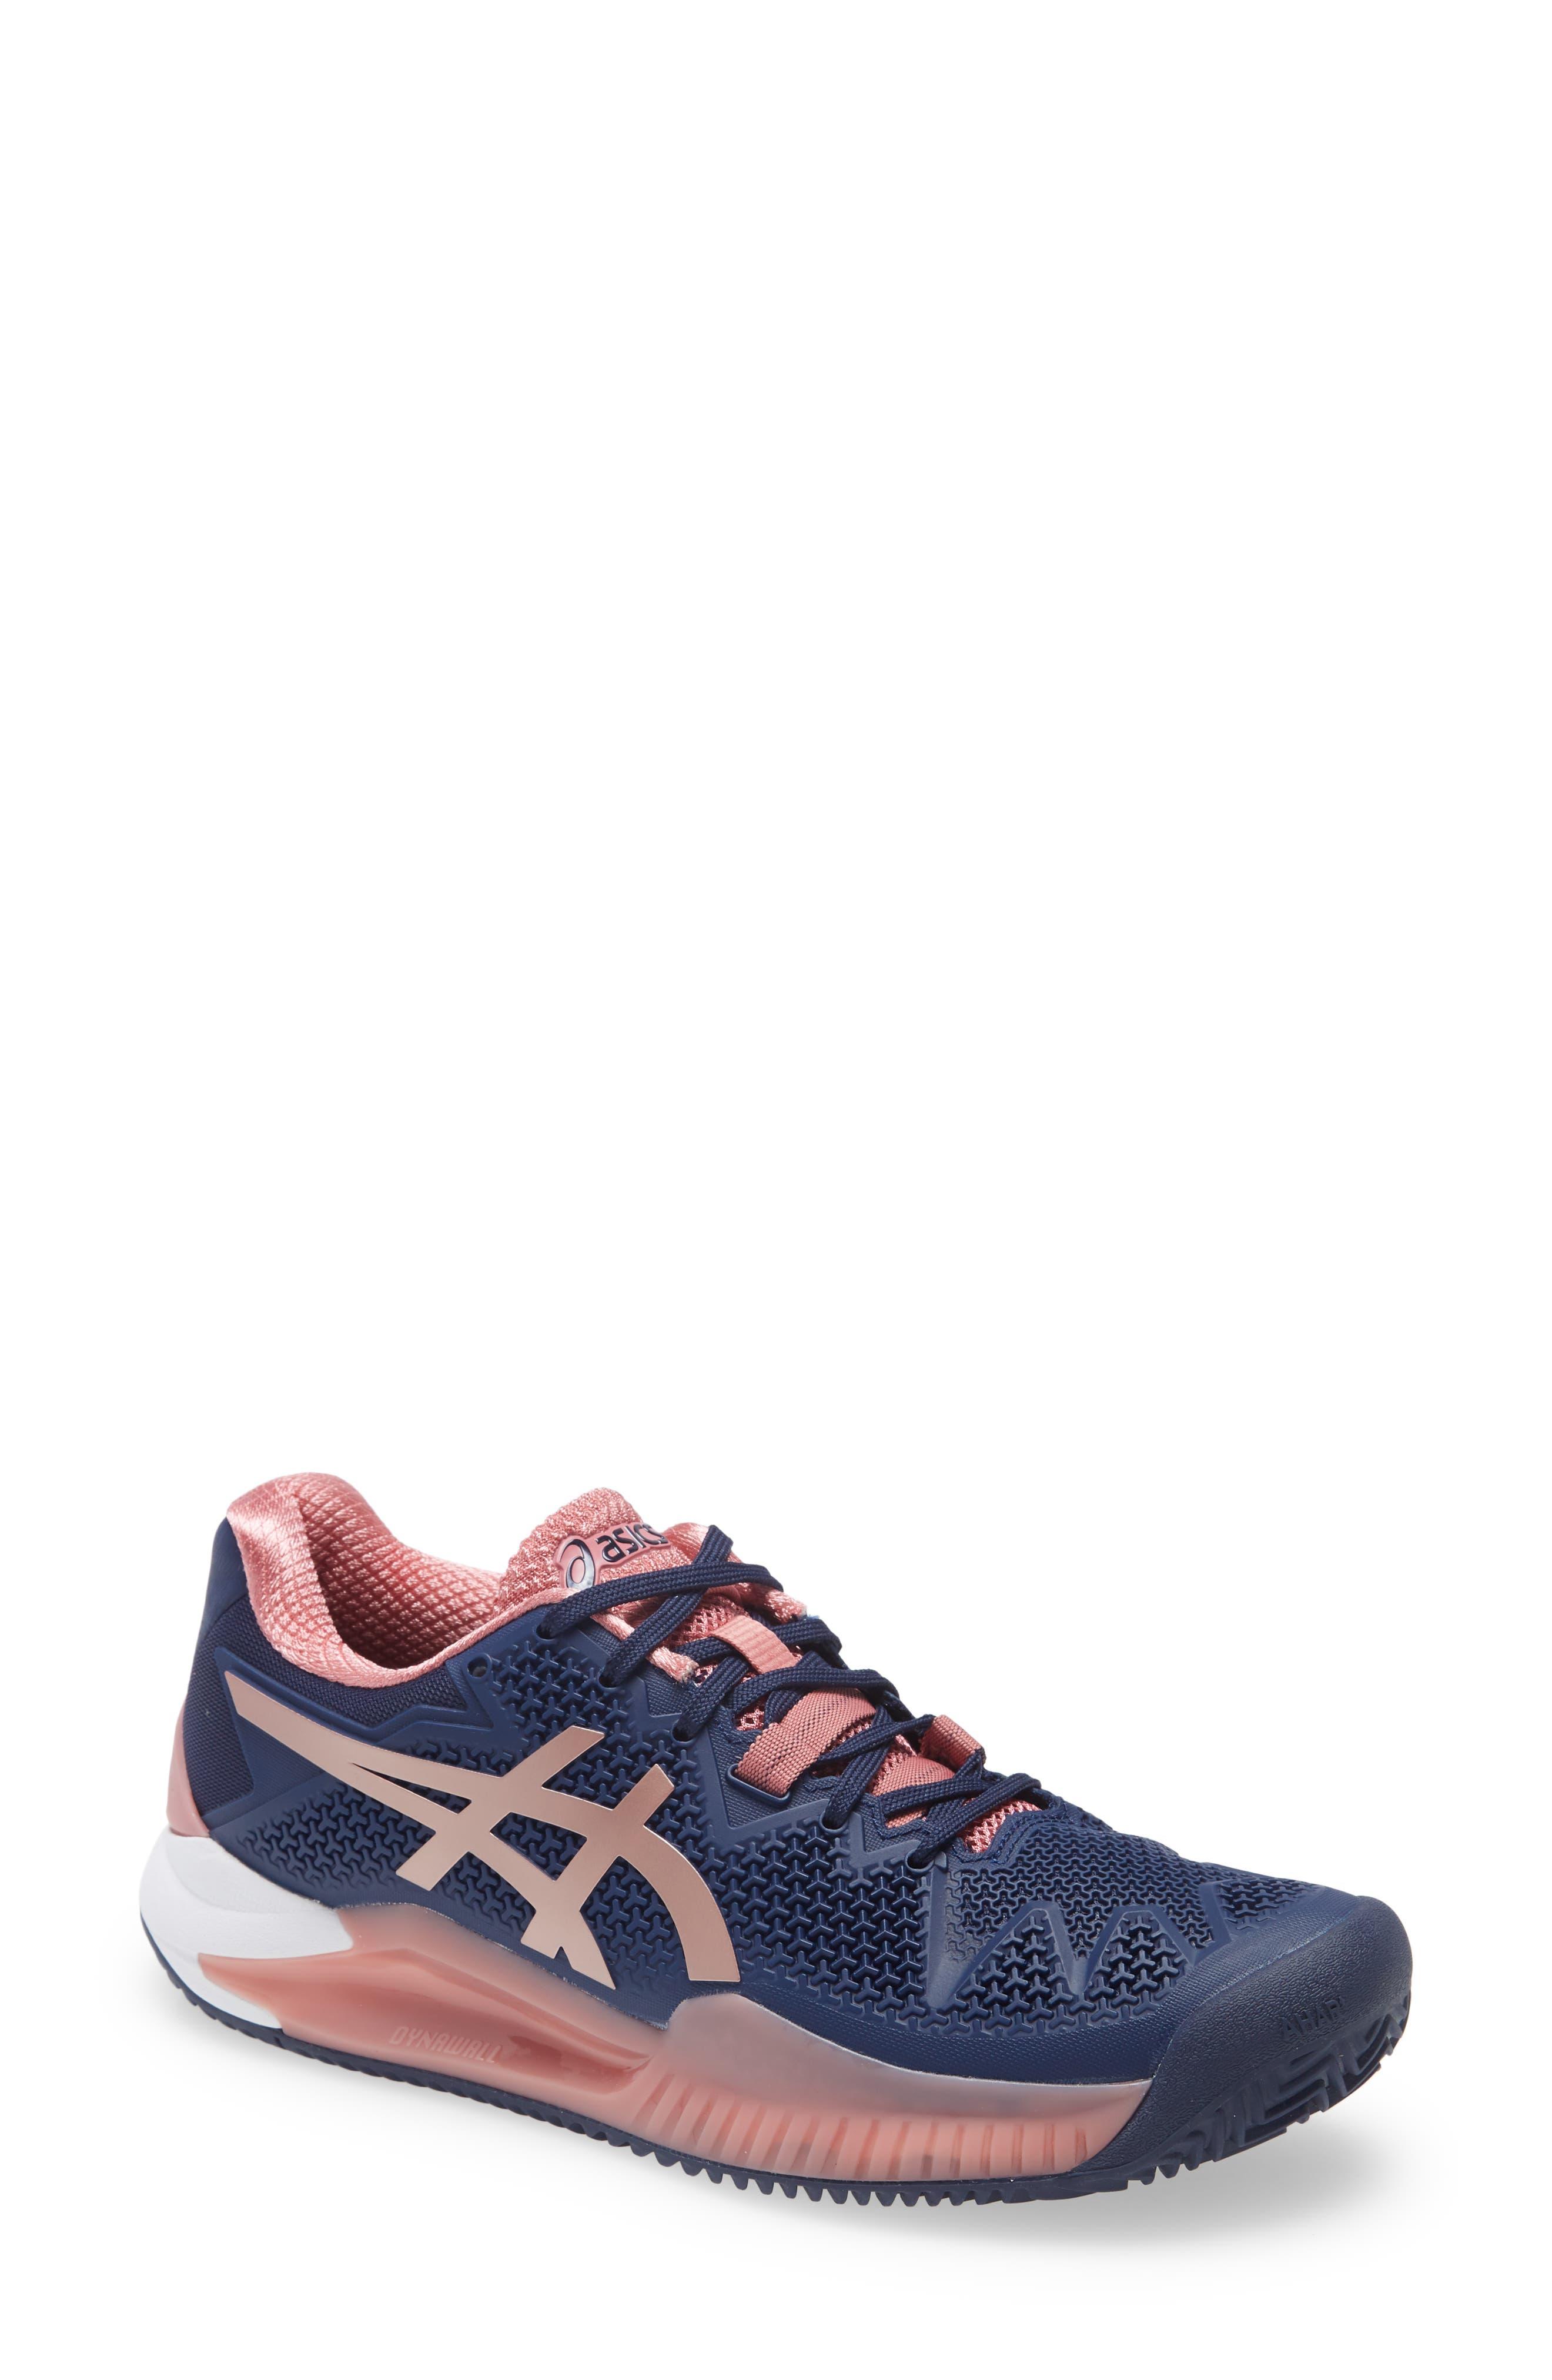 Women's Asics Gel-Resolution 8 Tennis Shoe